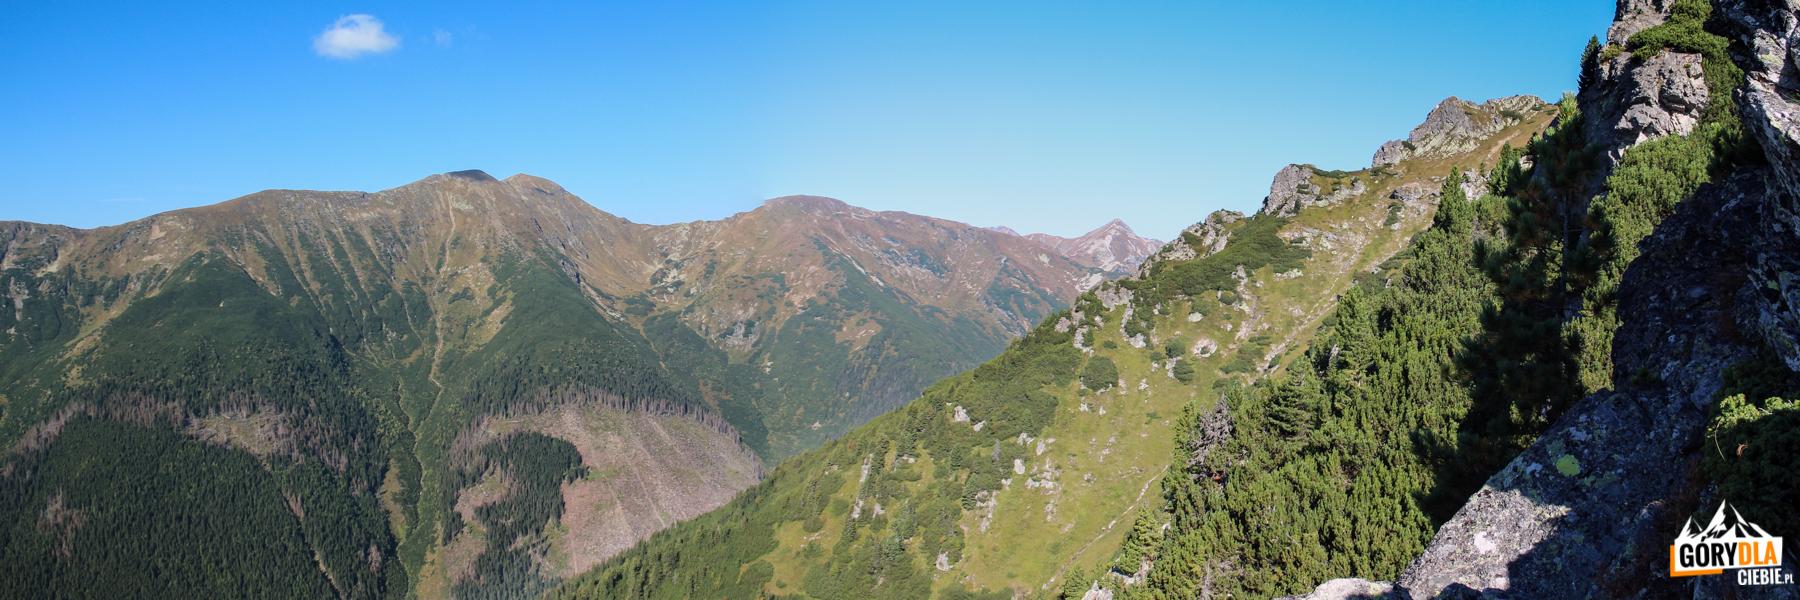 Widok zgrani nadOstredokiem naBaraniec (2185 m) iSmrek (2071 m)